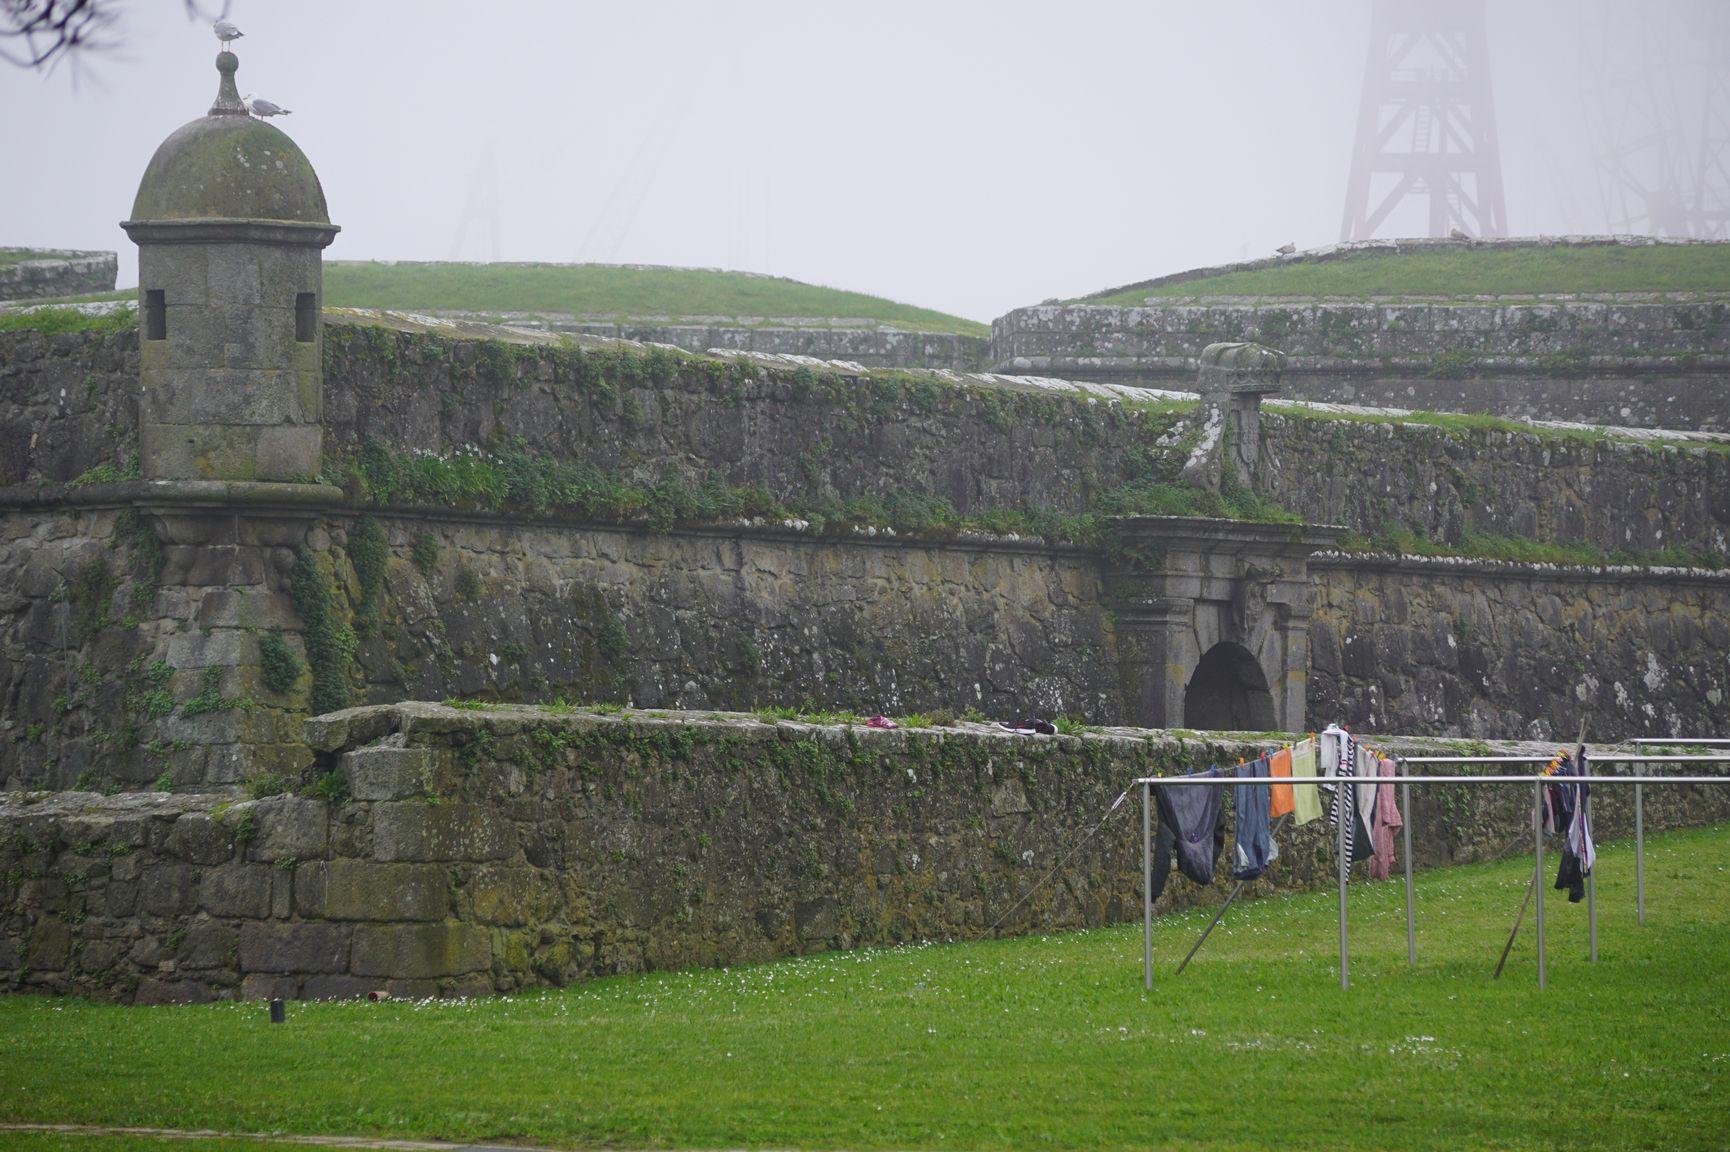 Viana do castelo mars 2020 (18)